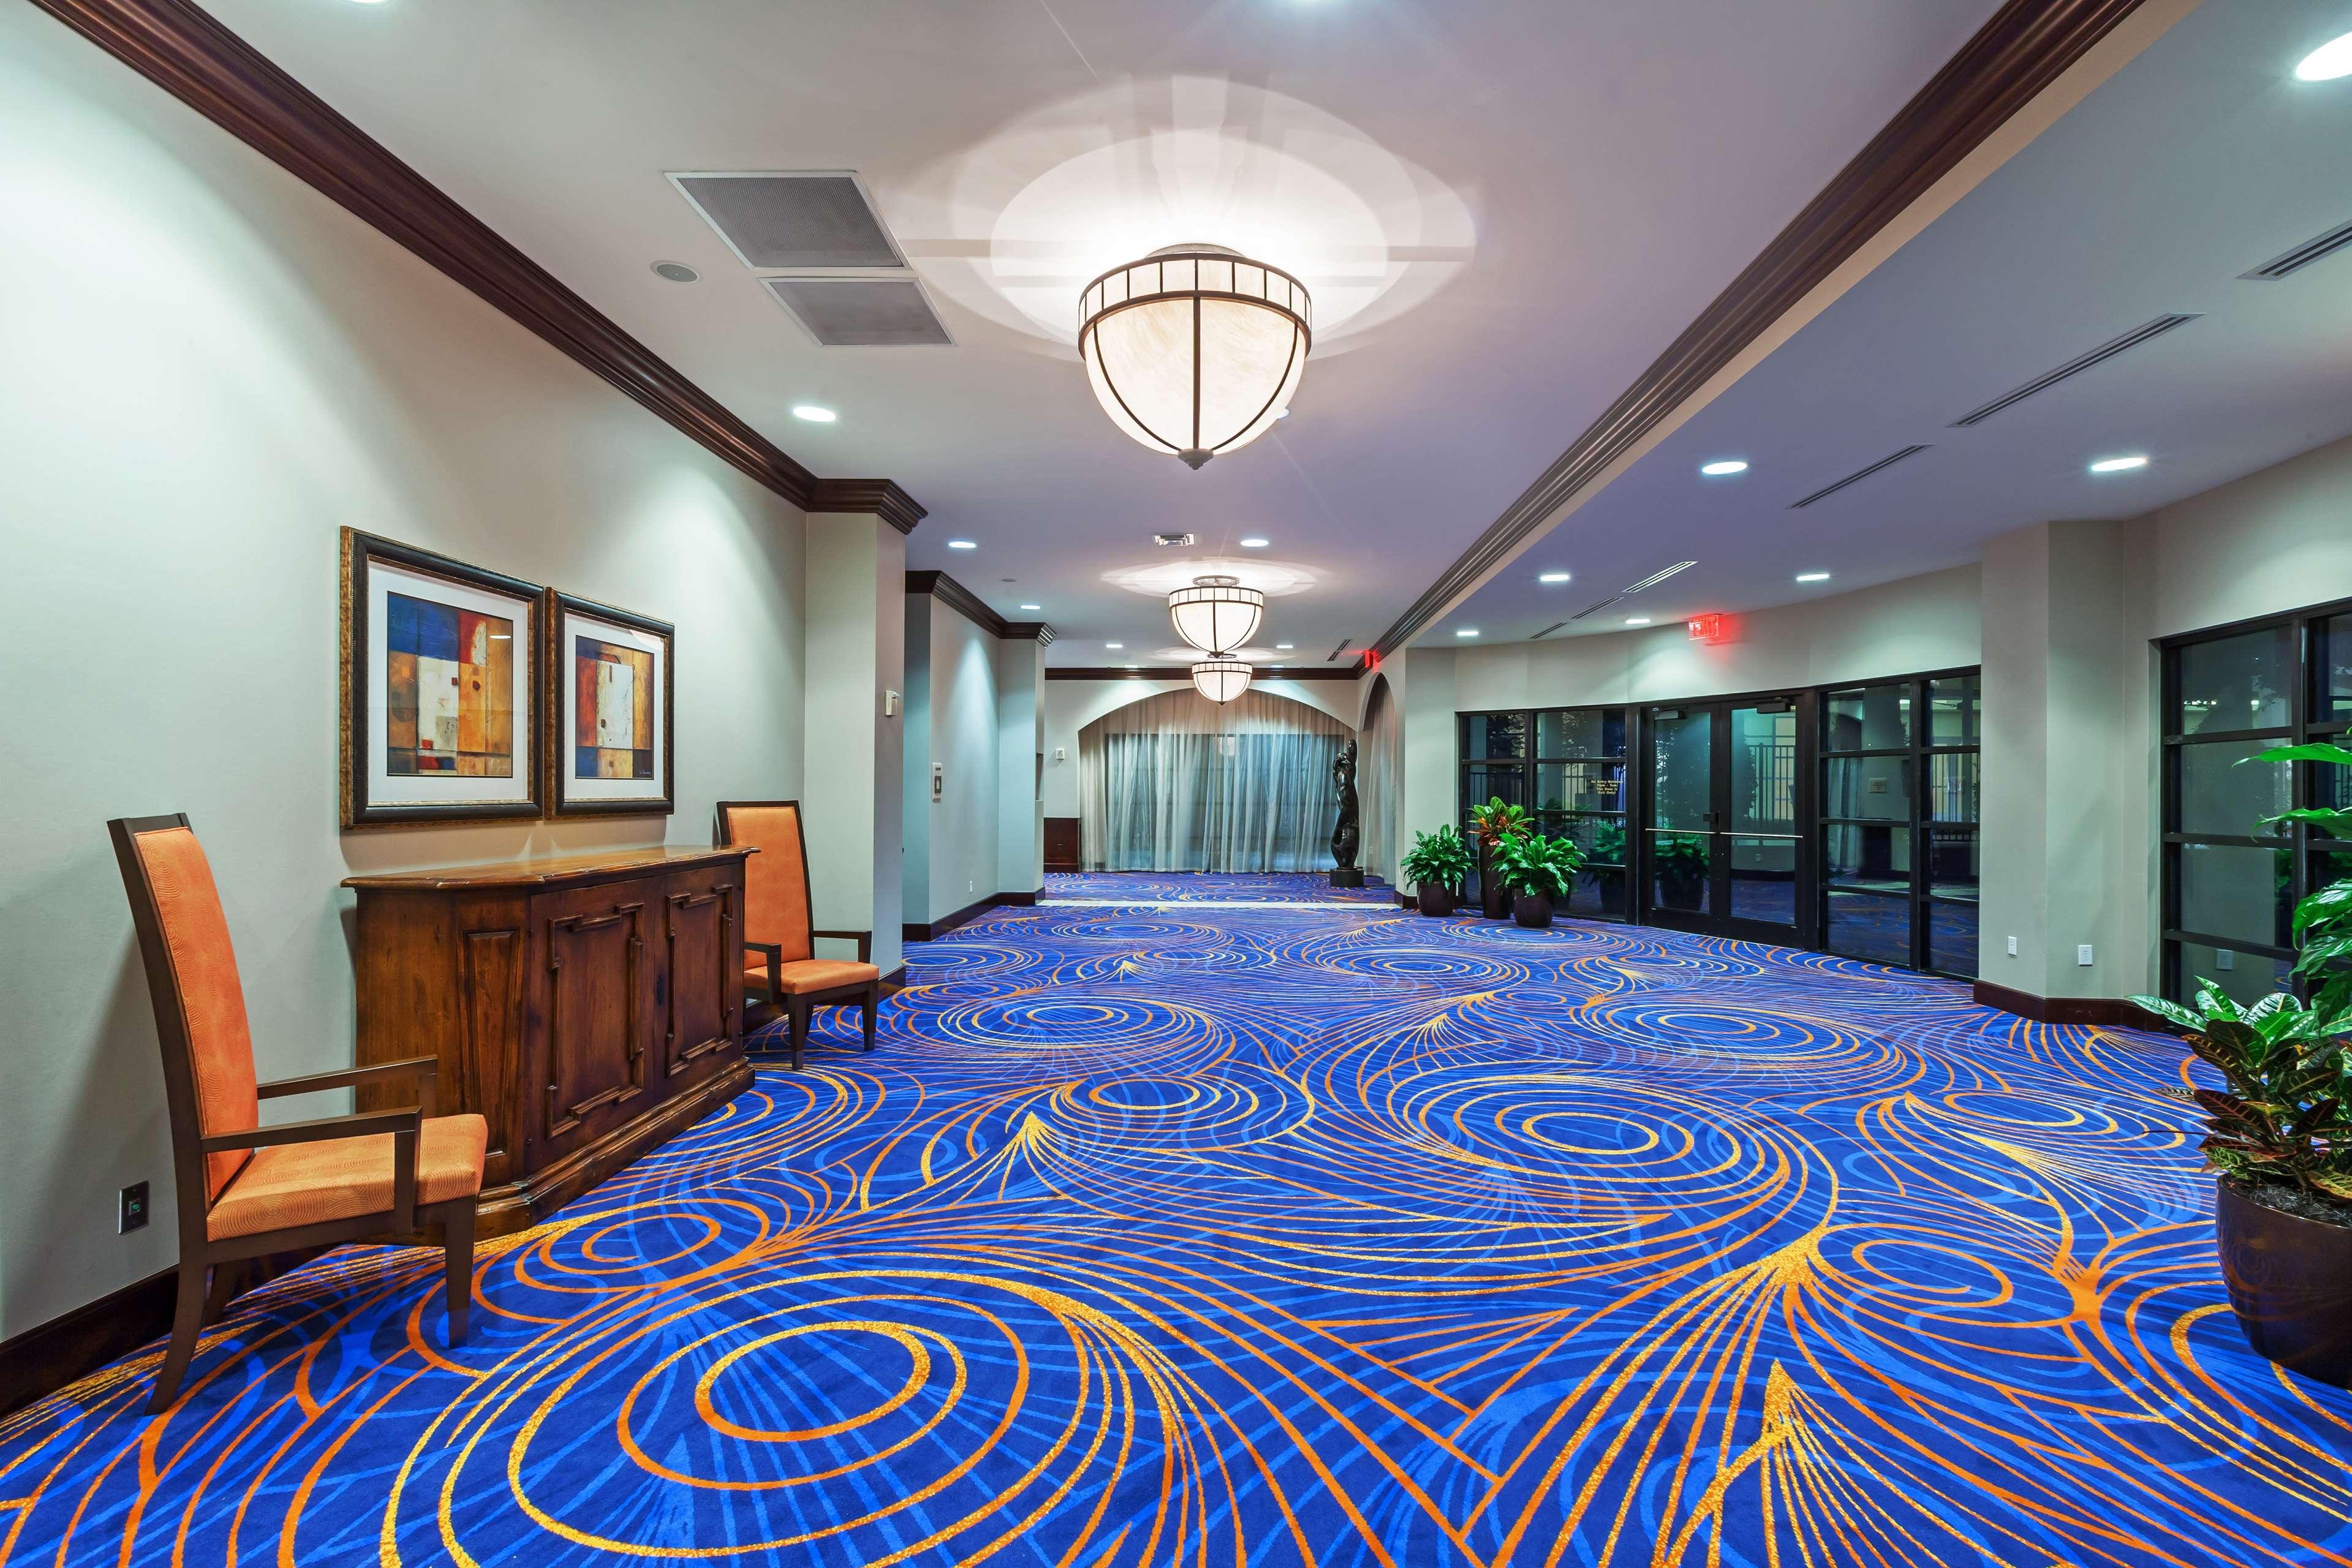 Hilton Waco image 55